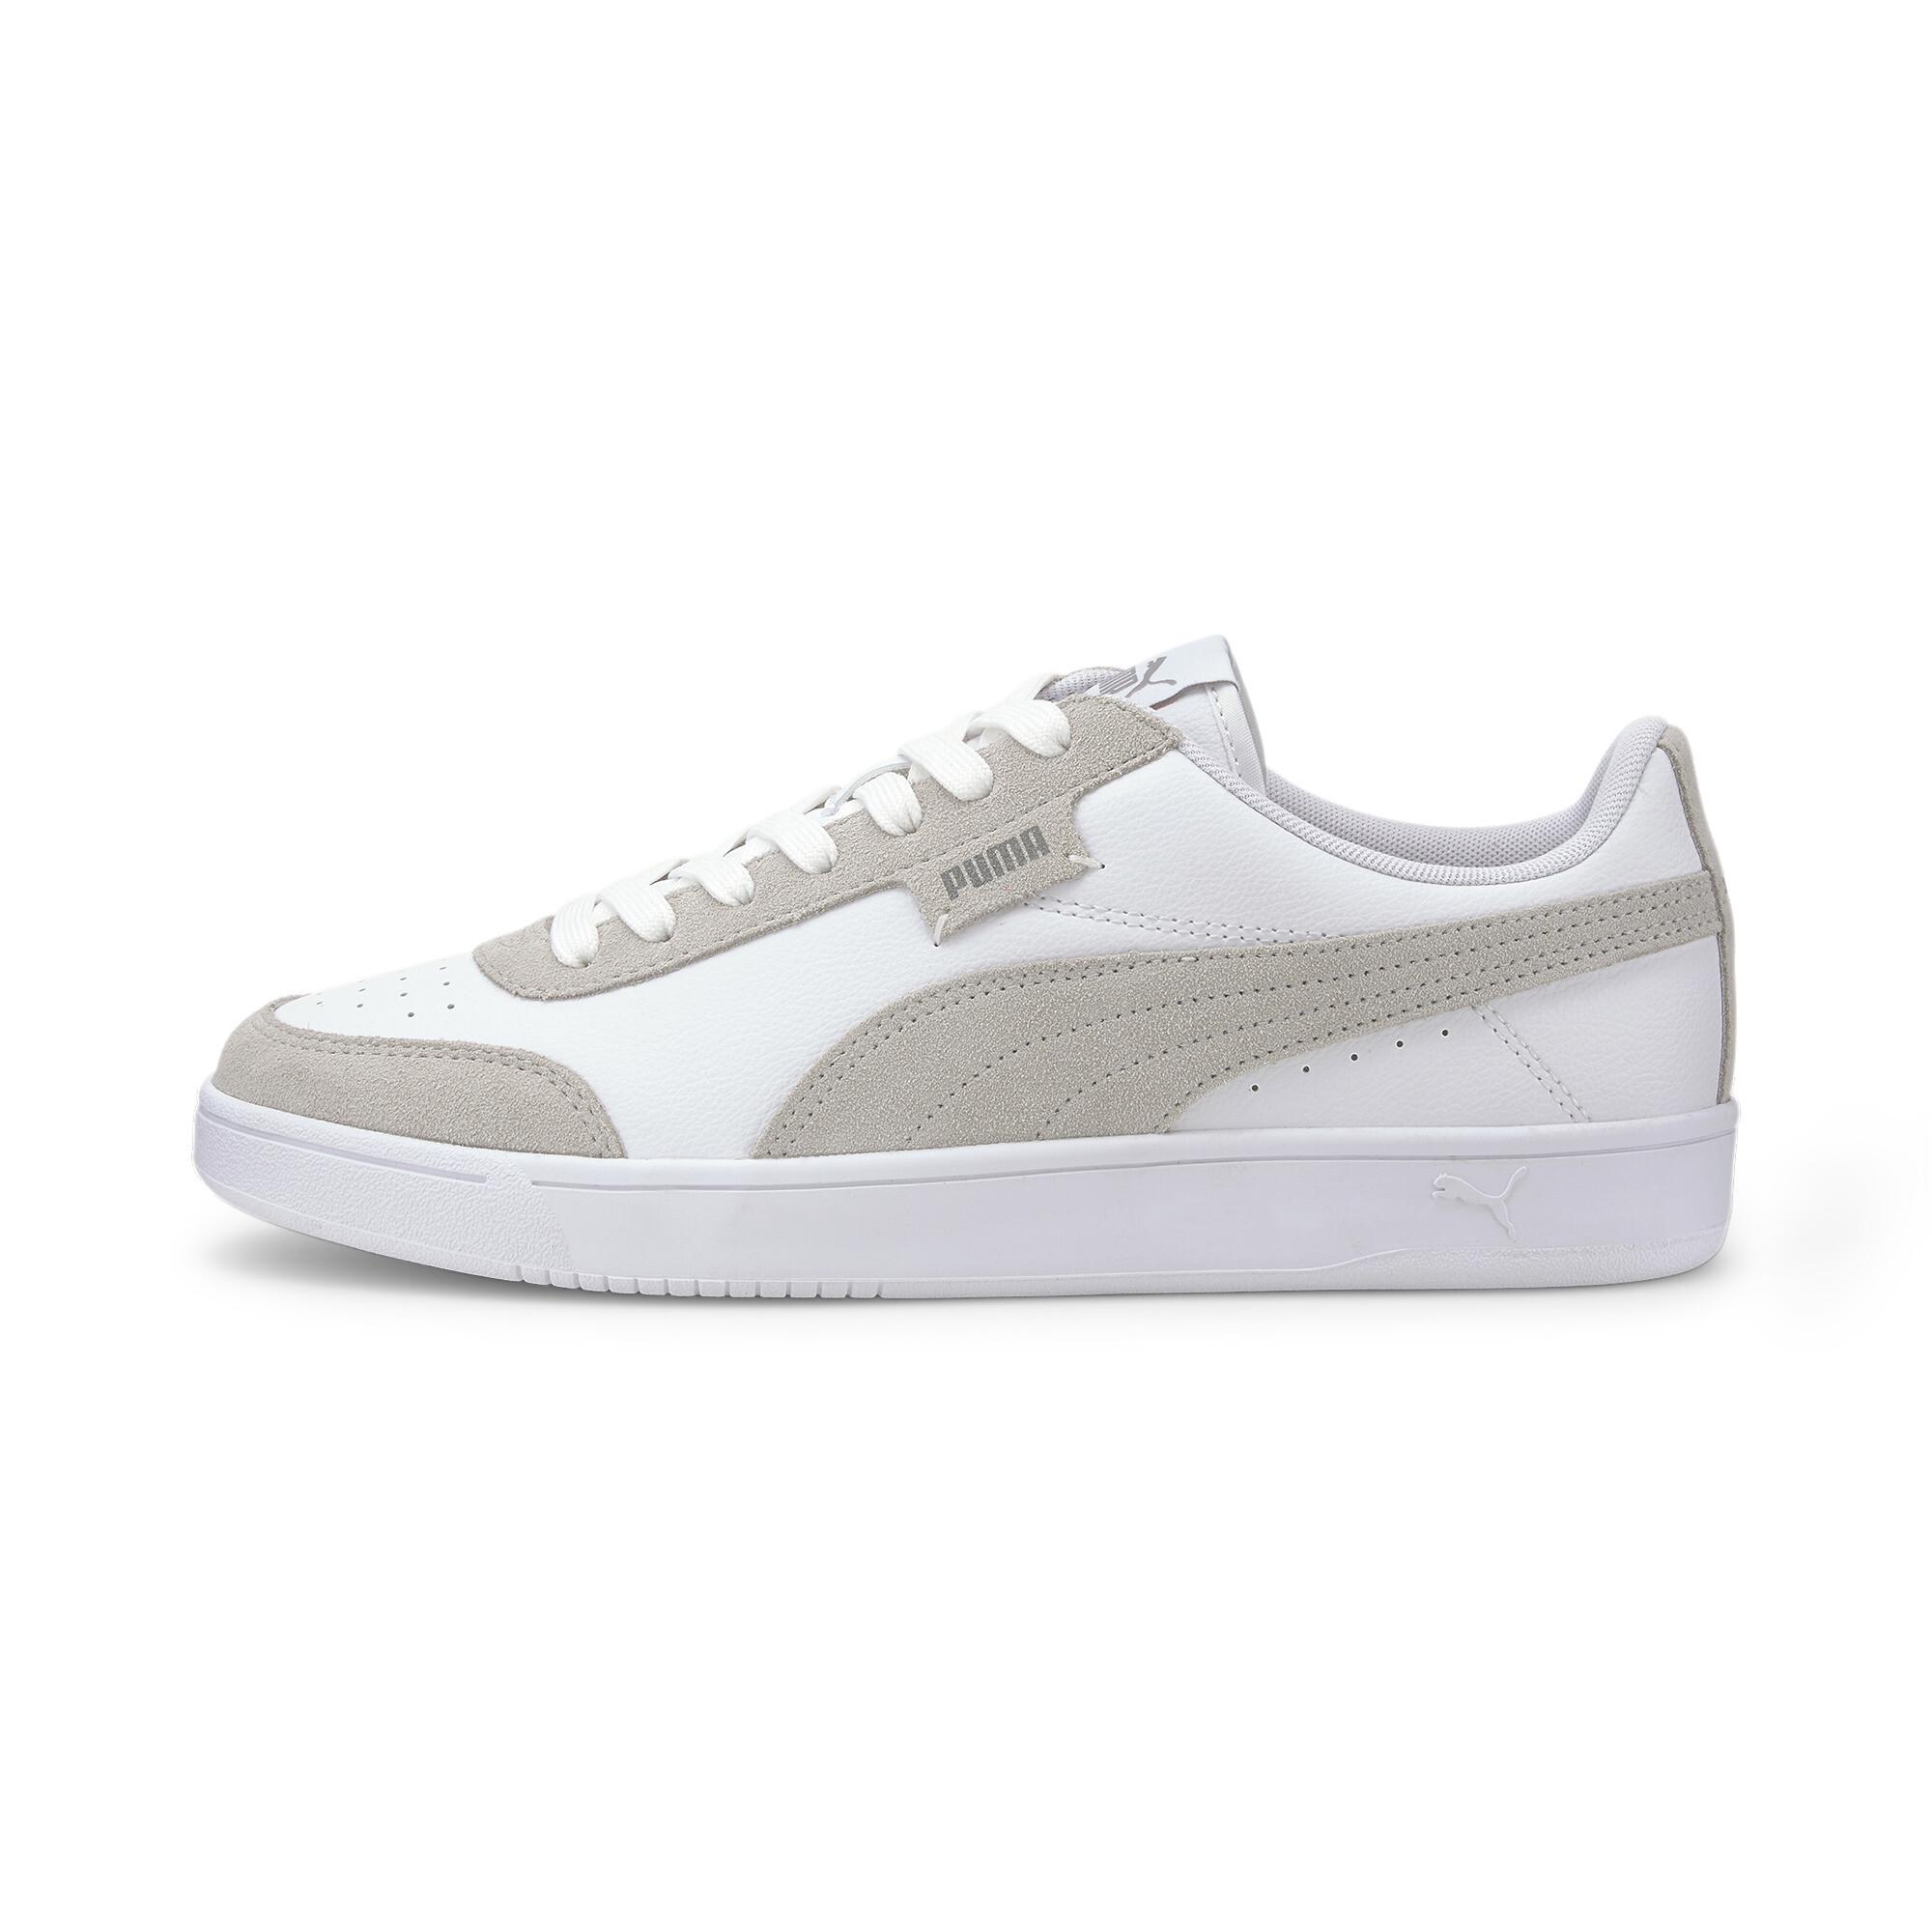 Indexbild 10 - PUMA Court Legend Lo Sneaker Unisex Schuhe Basics Neu